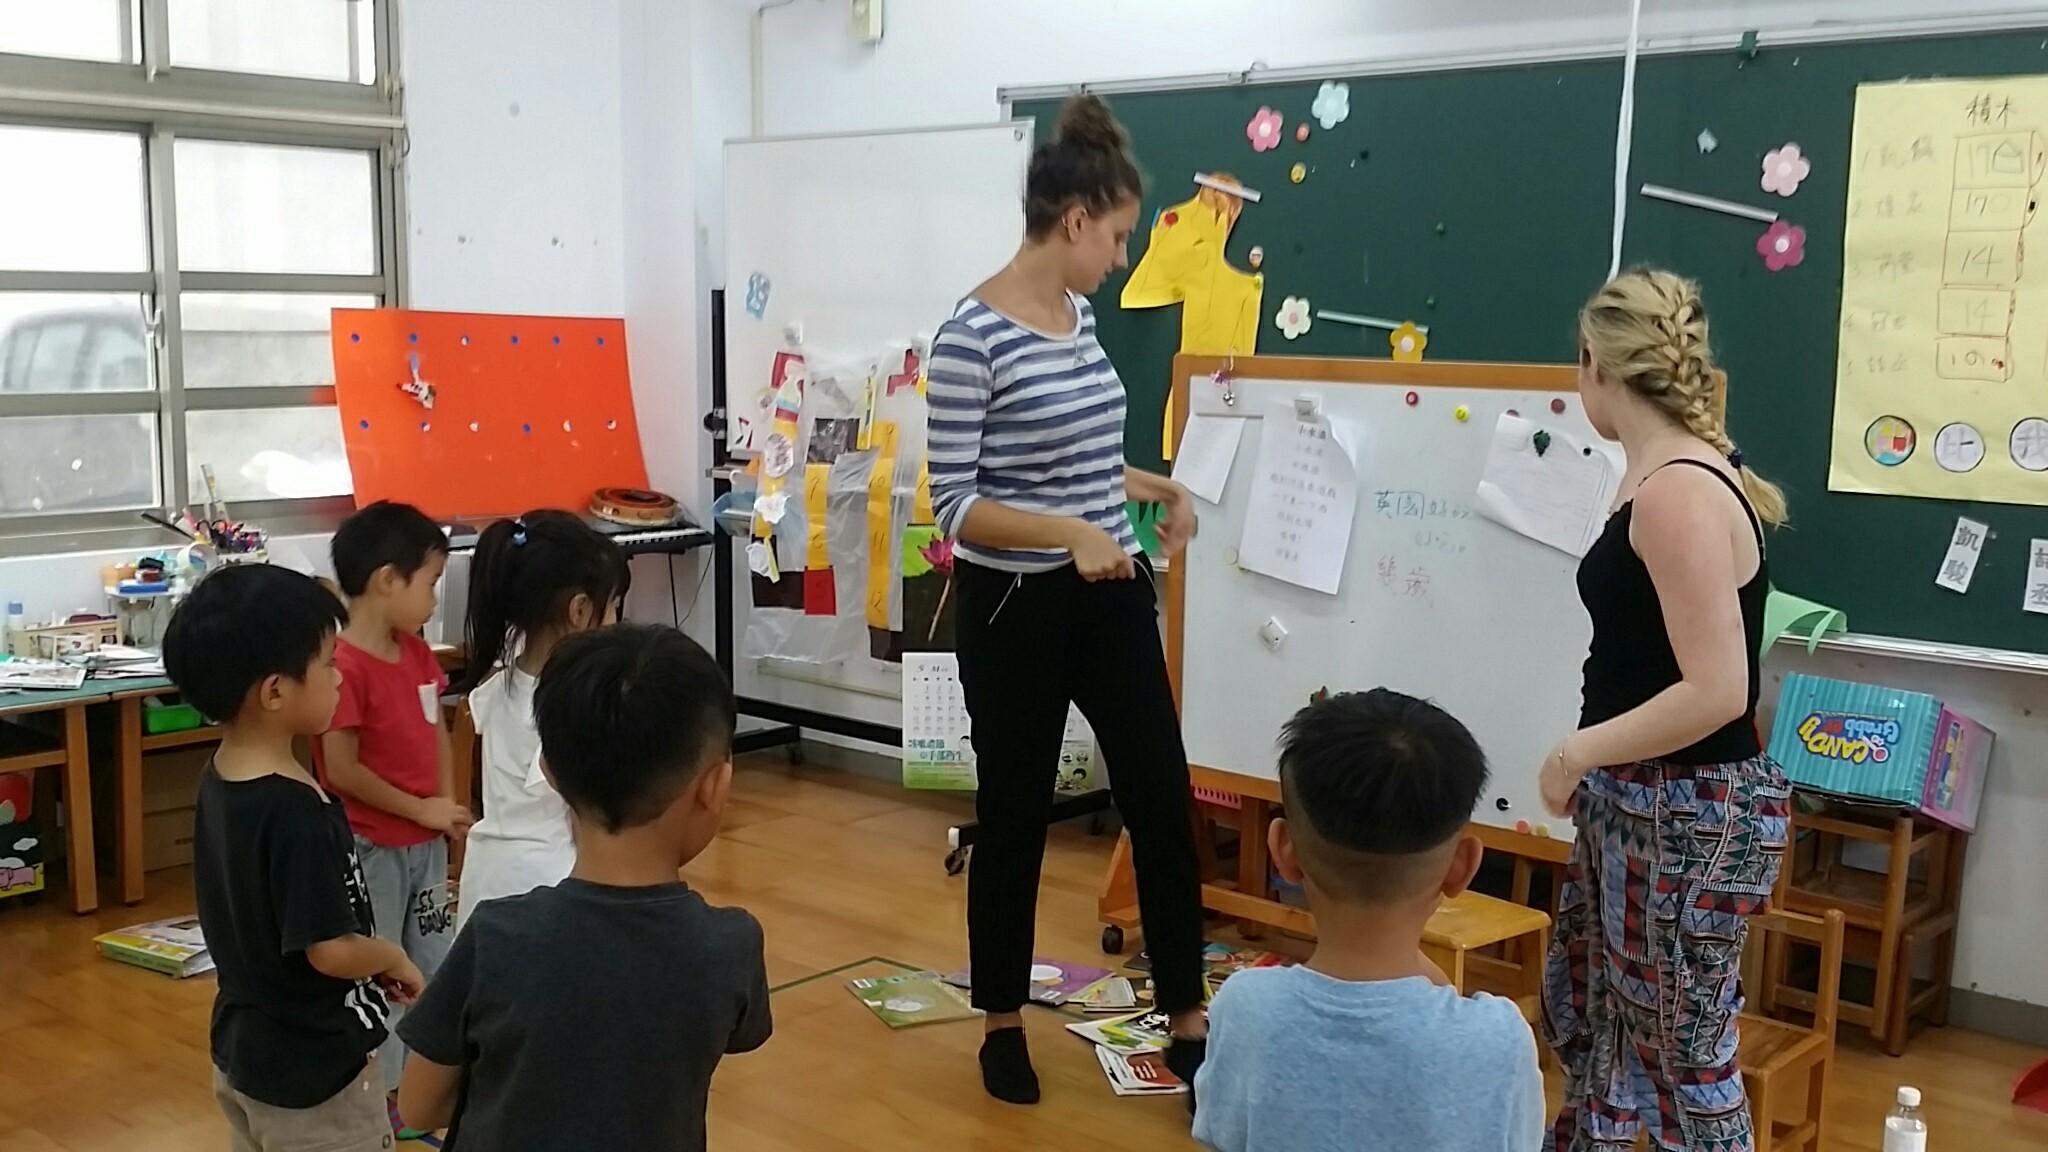 http://www.tses.cyc.edu.tw/uploads/tadgallery/2017_06_30/3851_國際志工幼兒園_170630_0012.jpg